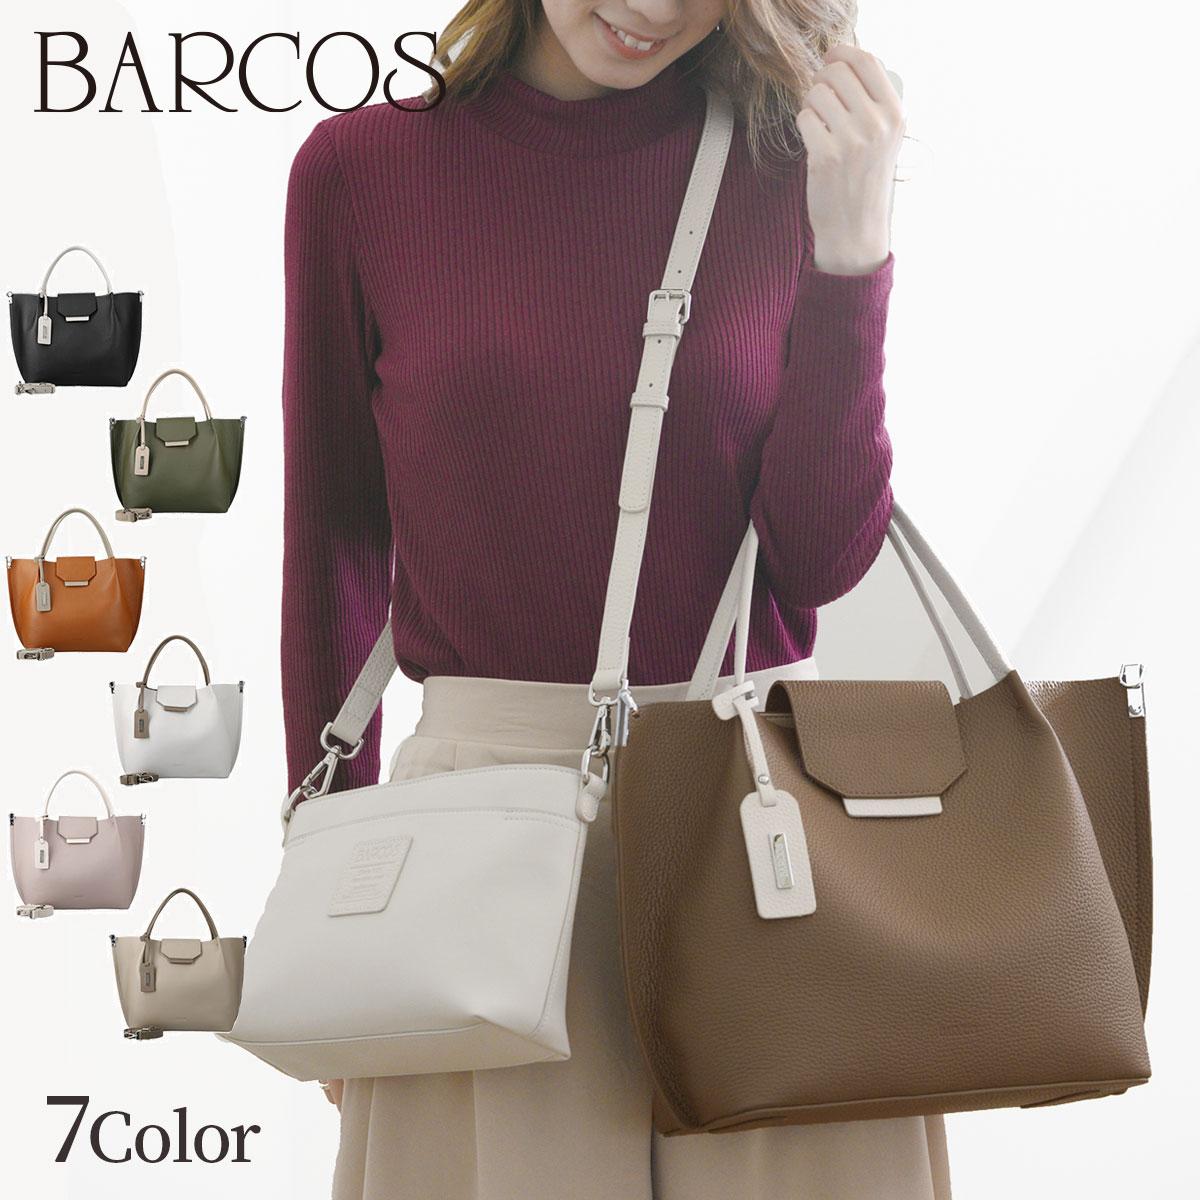 BARCOS BARCOS シュリンクレザーバイカラーハンドバッグ シャーロット レディース 全7色 ONESIZE バルコス:バルコス公式ショップ店